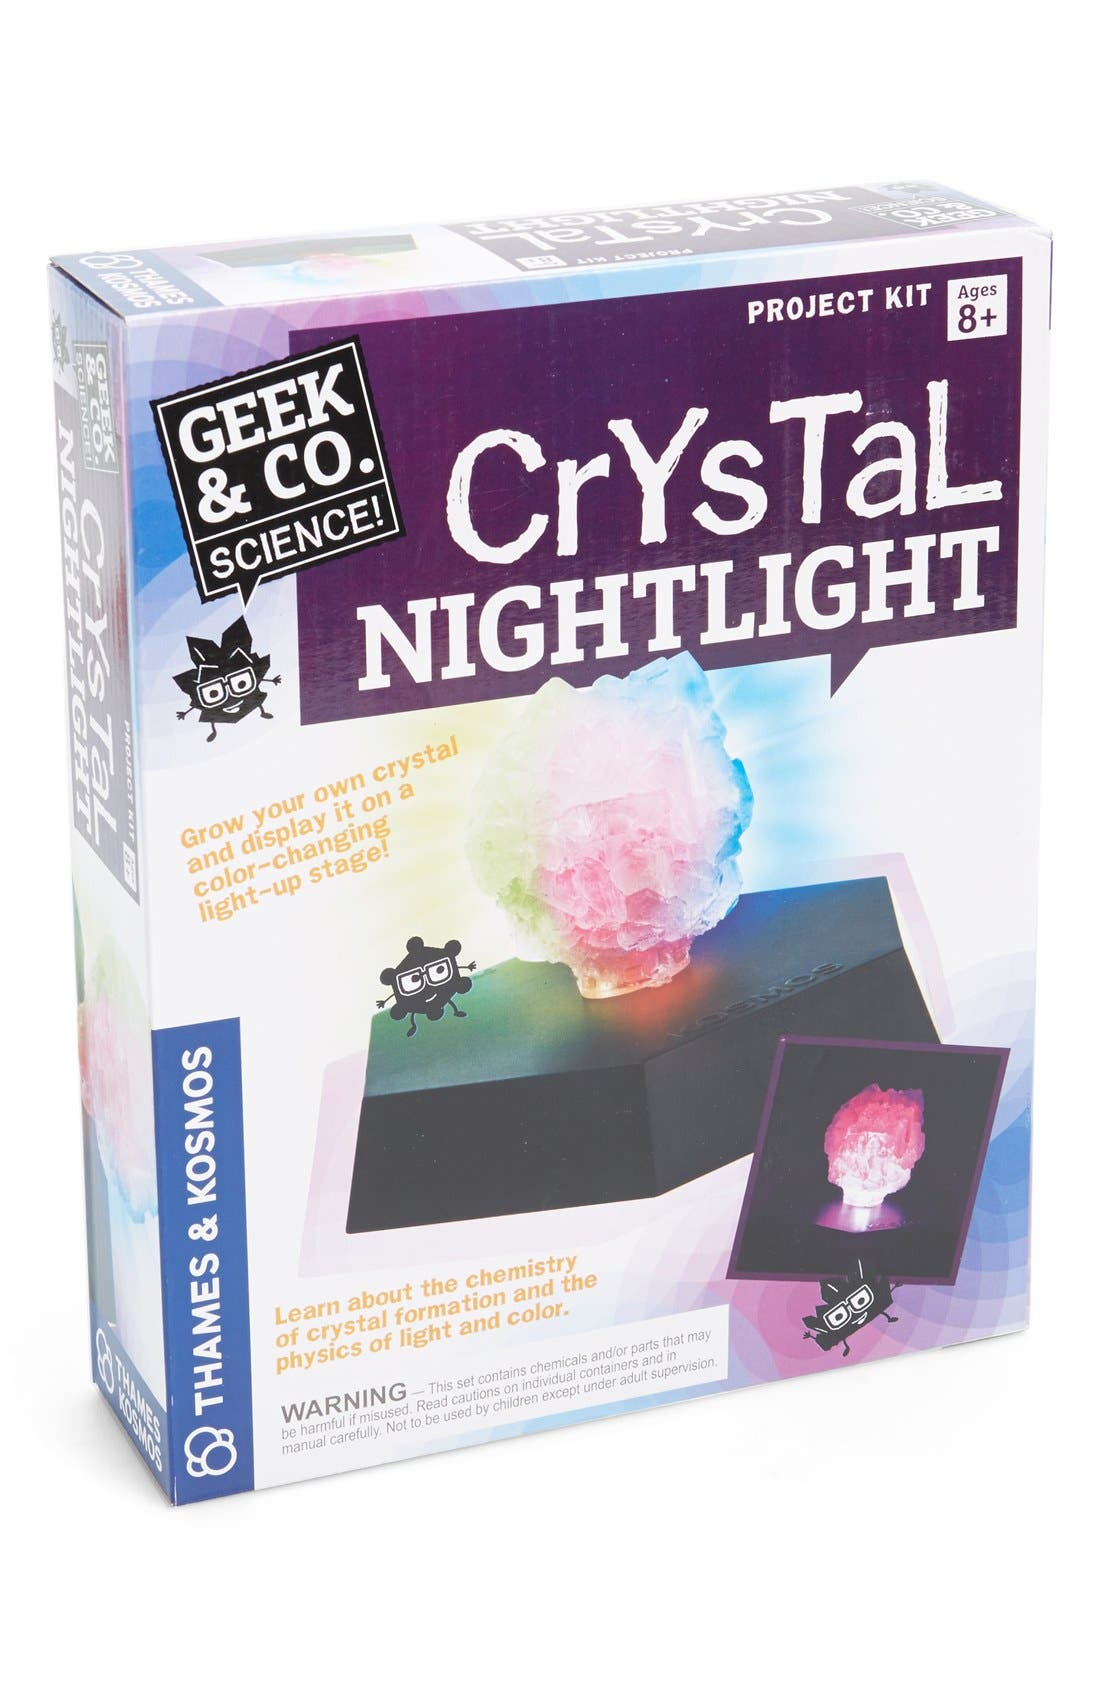 Main Image - Thames & Kosmos Crystal Nightlight Kit